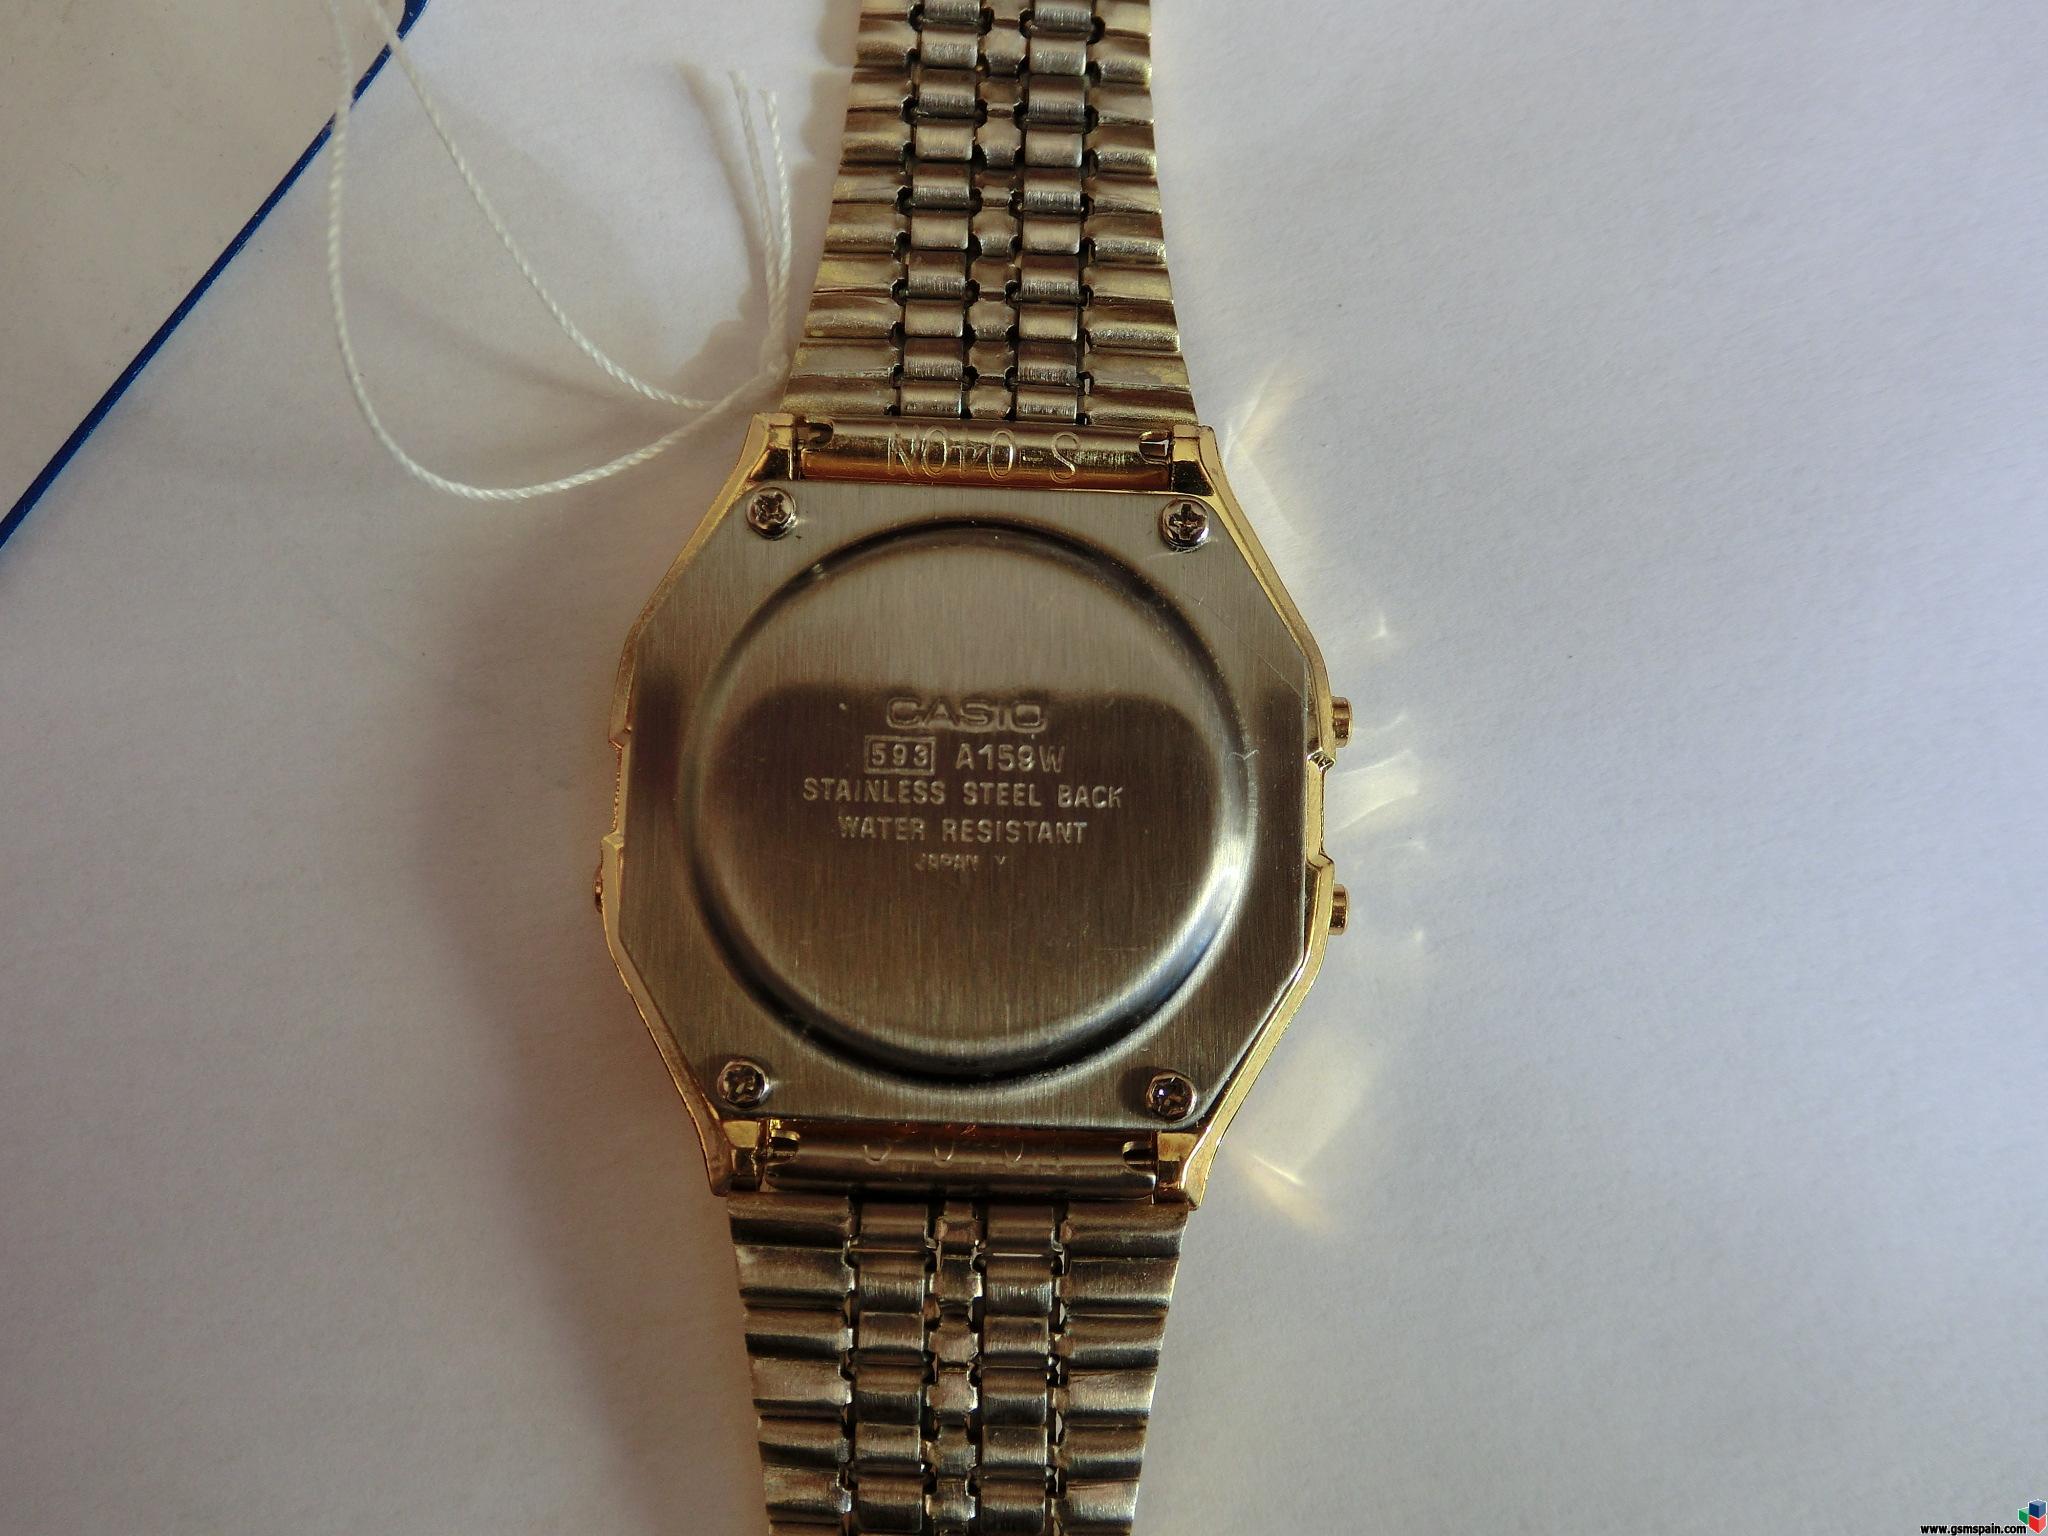 3b2da2aaa1 relojes casio liquidacion